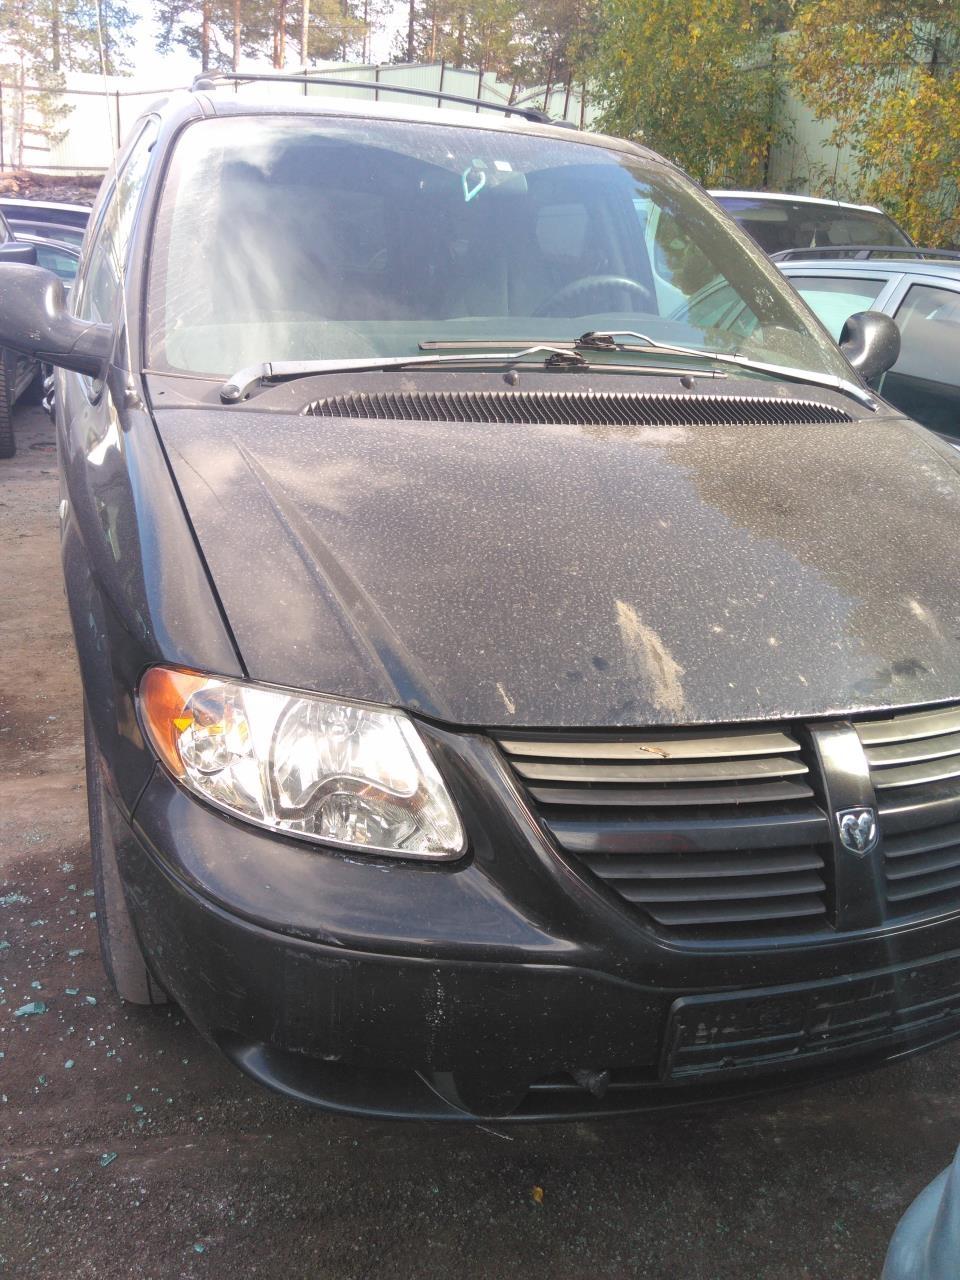 Dodge Caravan 2001-2007 delebil , Motorkode: EGA, Girkassekode: DGL